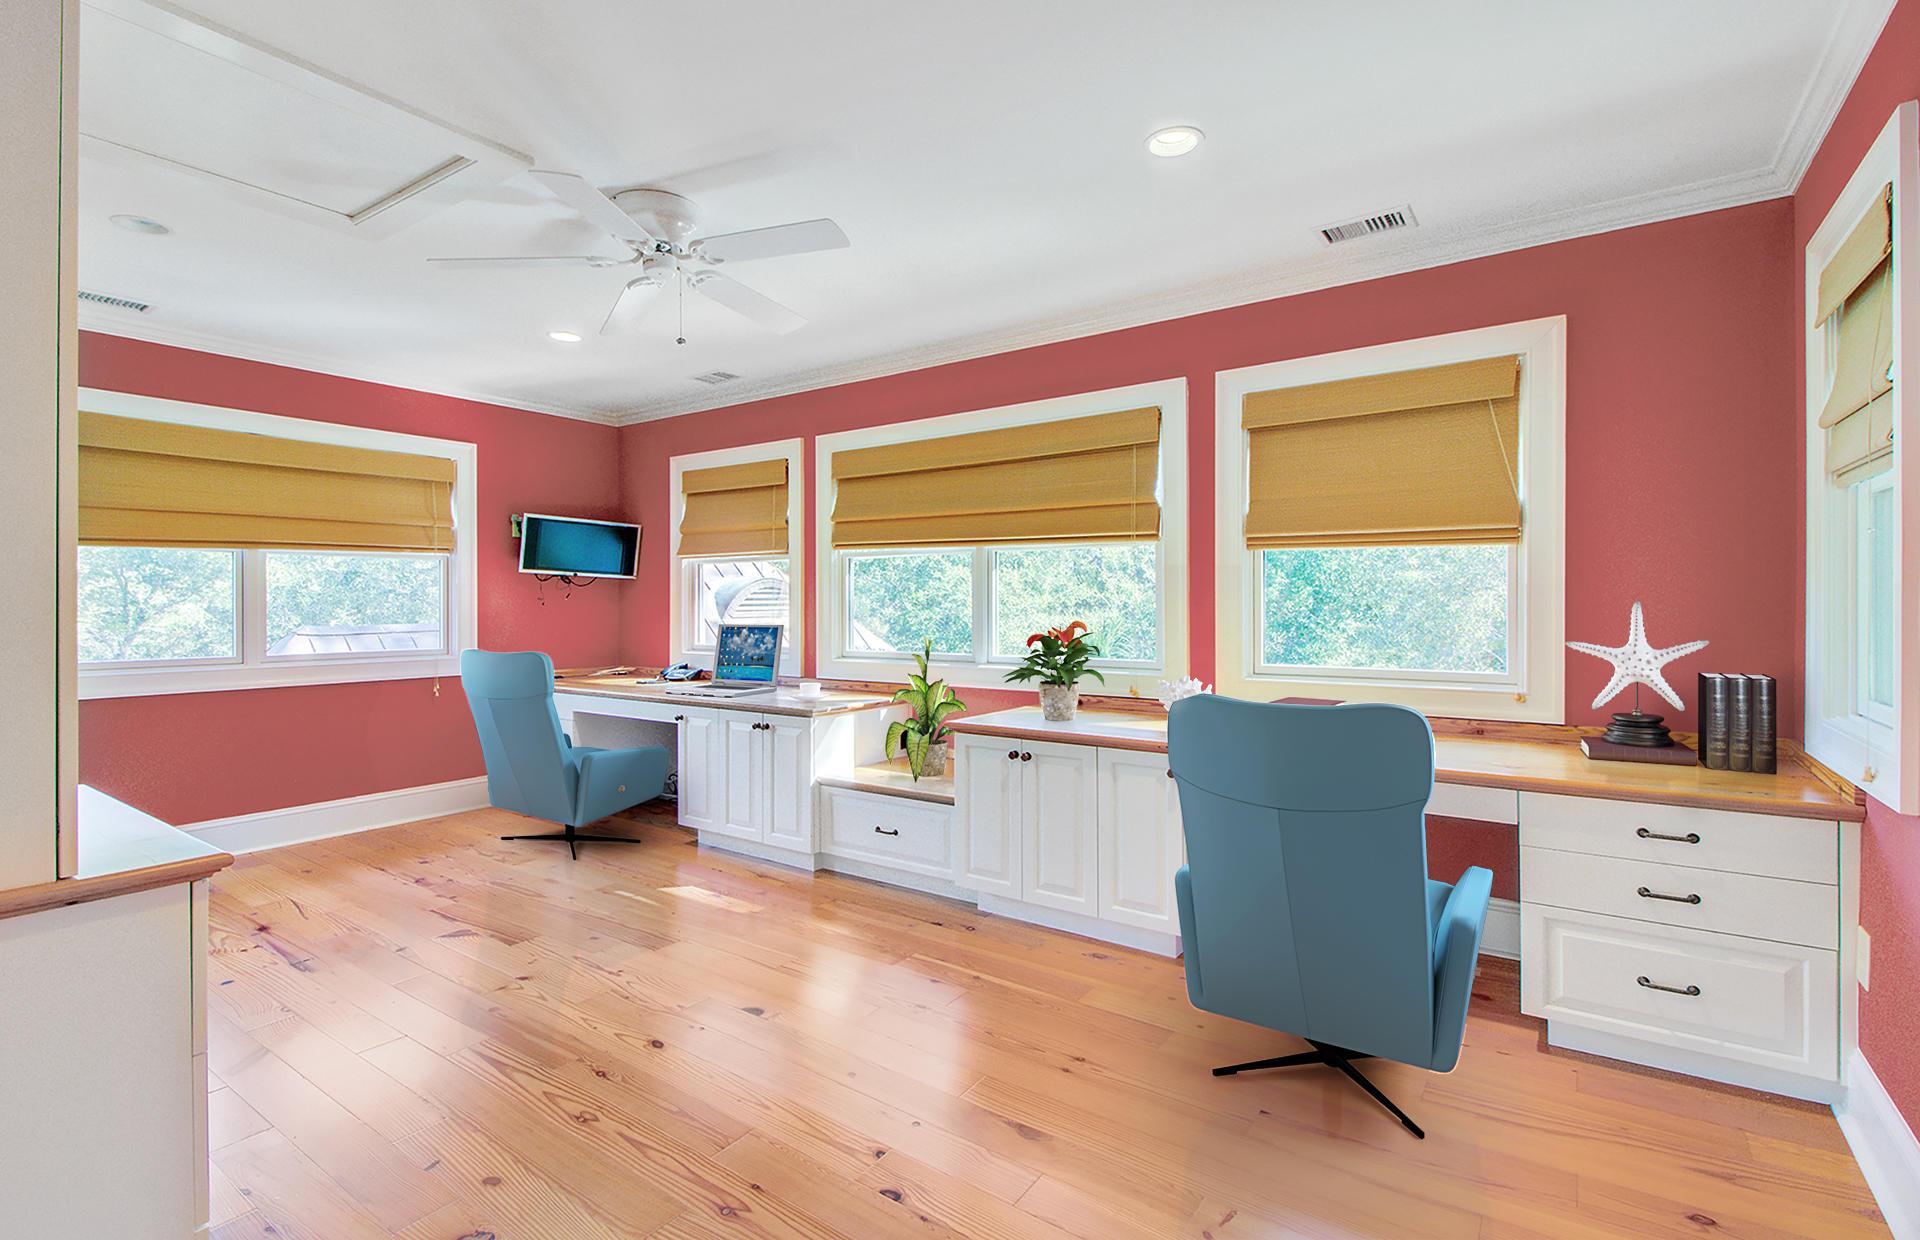 Kiawah Island Homes For Sale - 402 Ocean Oaks, Kiawah Island, SC - 28